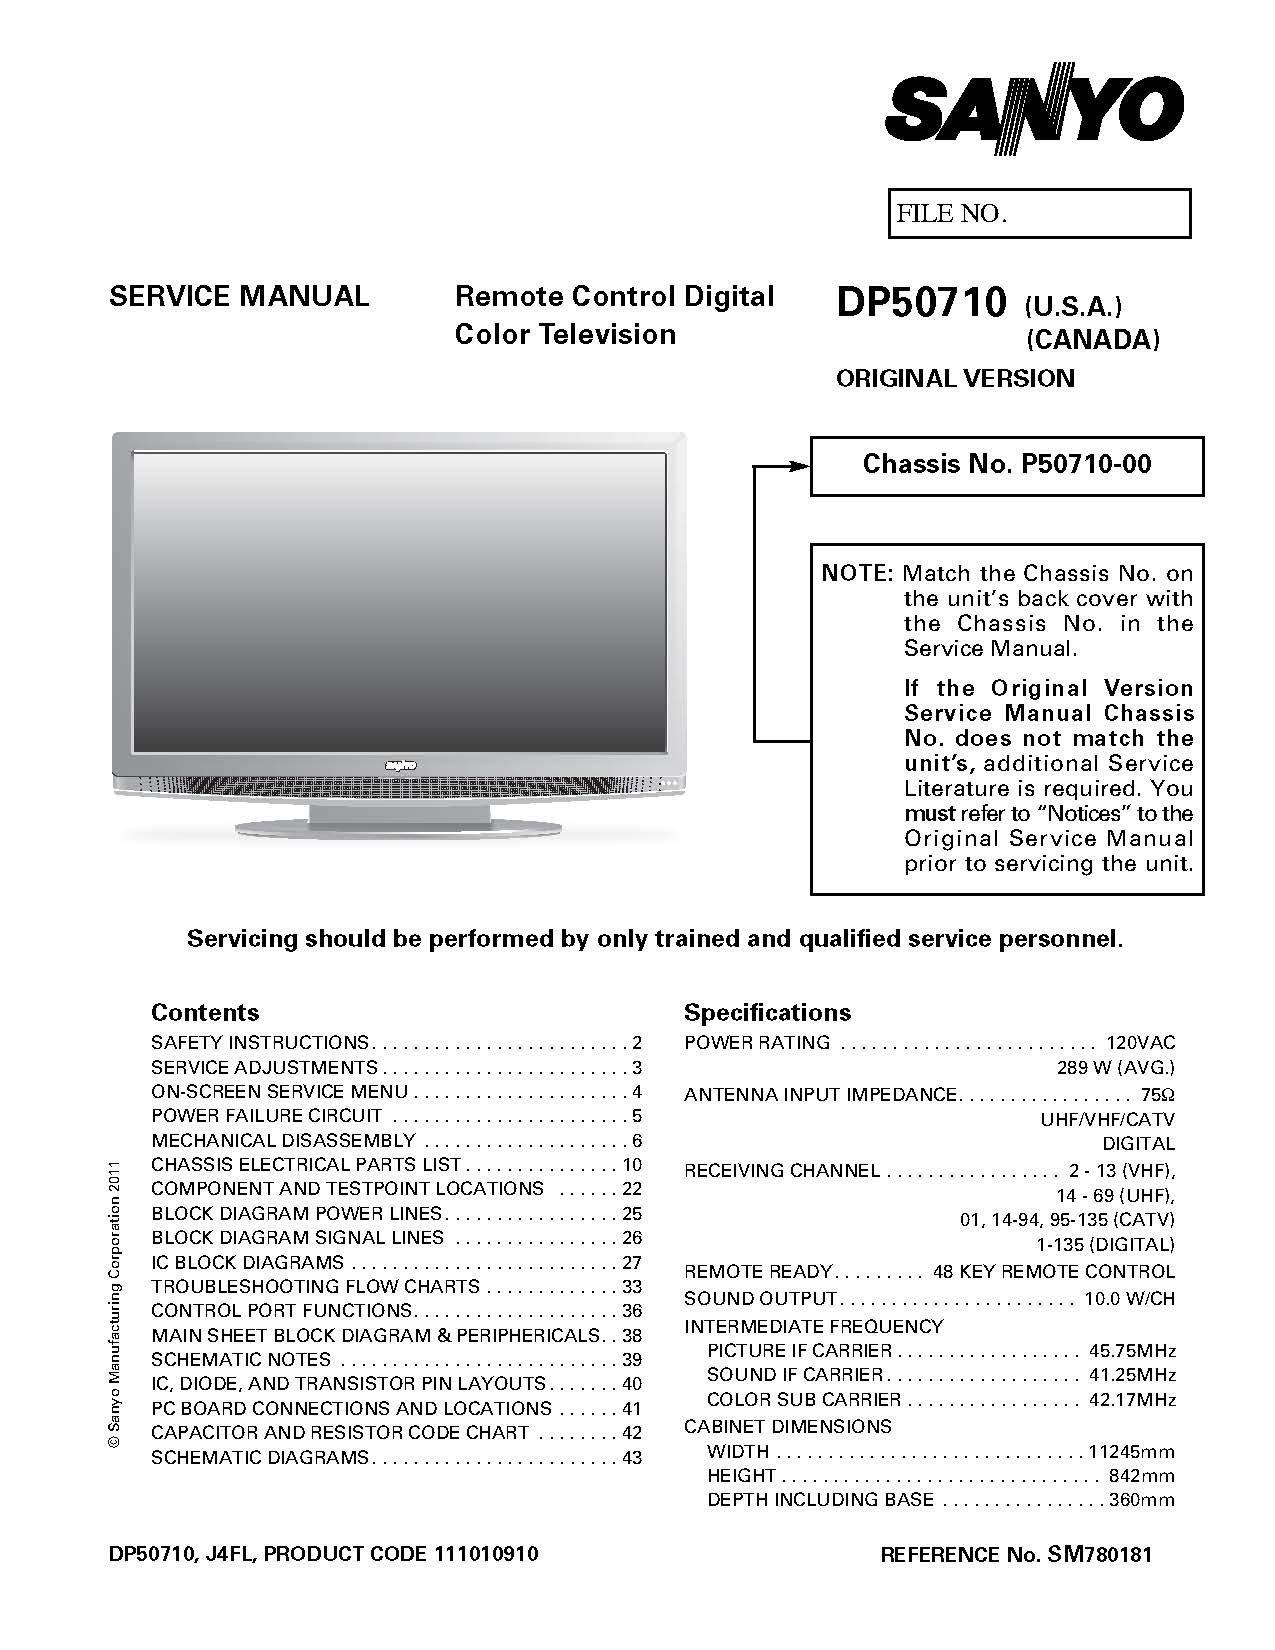 sanyo dp50710 service manual with schematics sanyo amazon com books rh amazon com Instruction Manual Example Instruction Manual Book